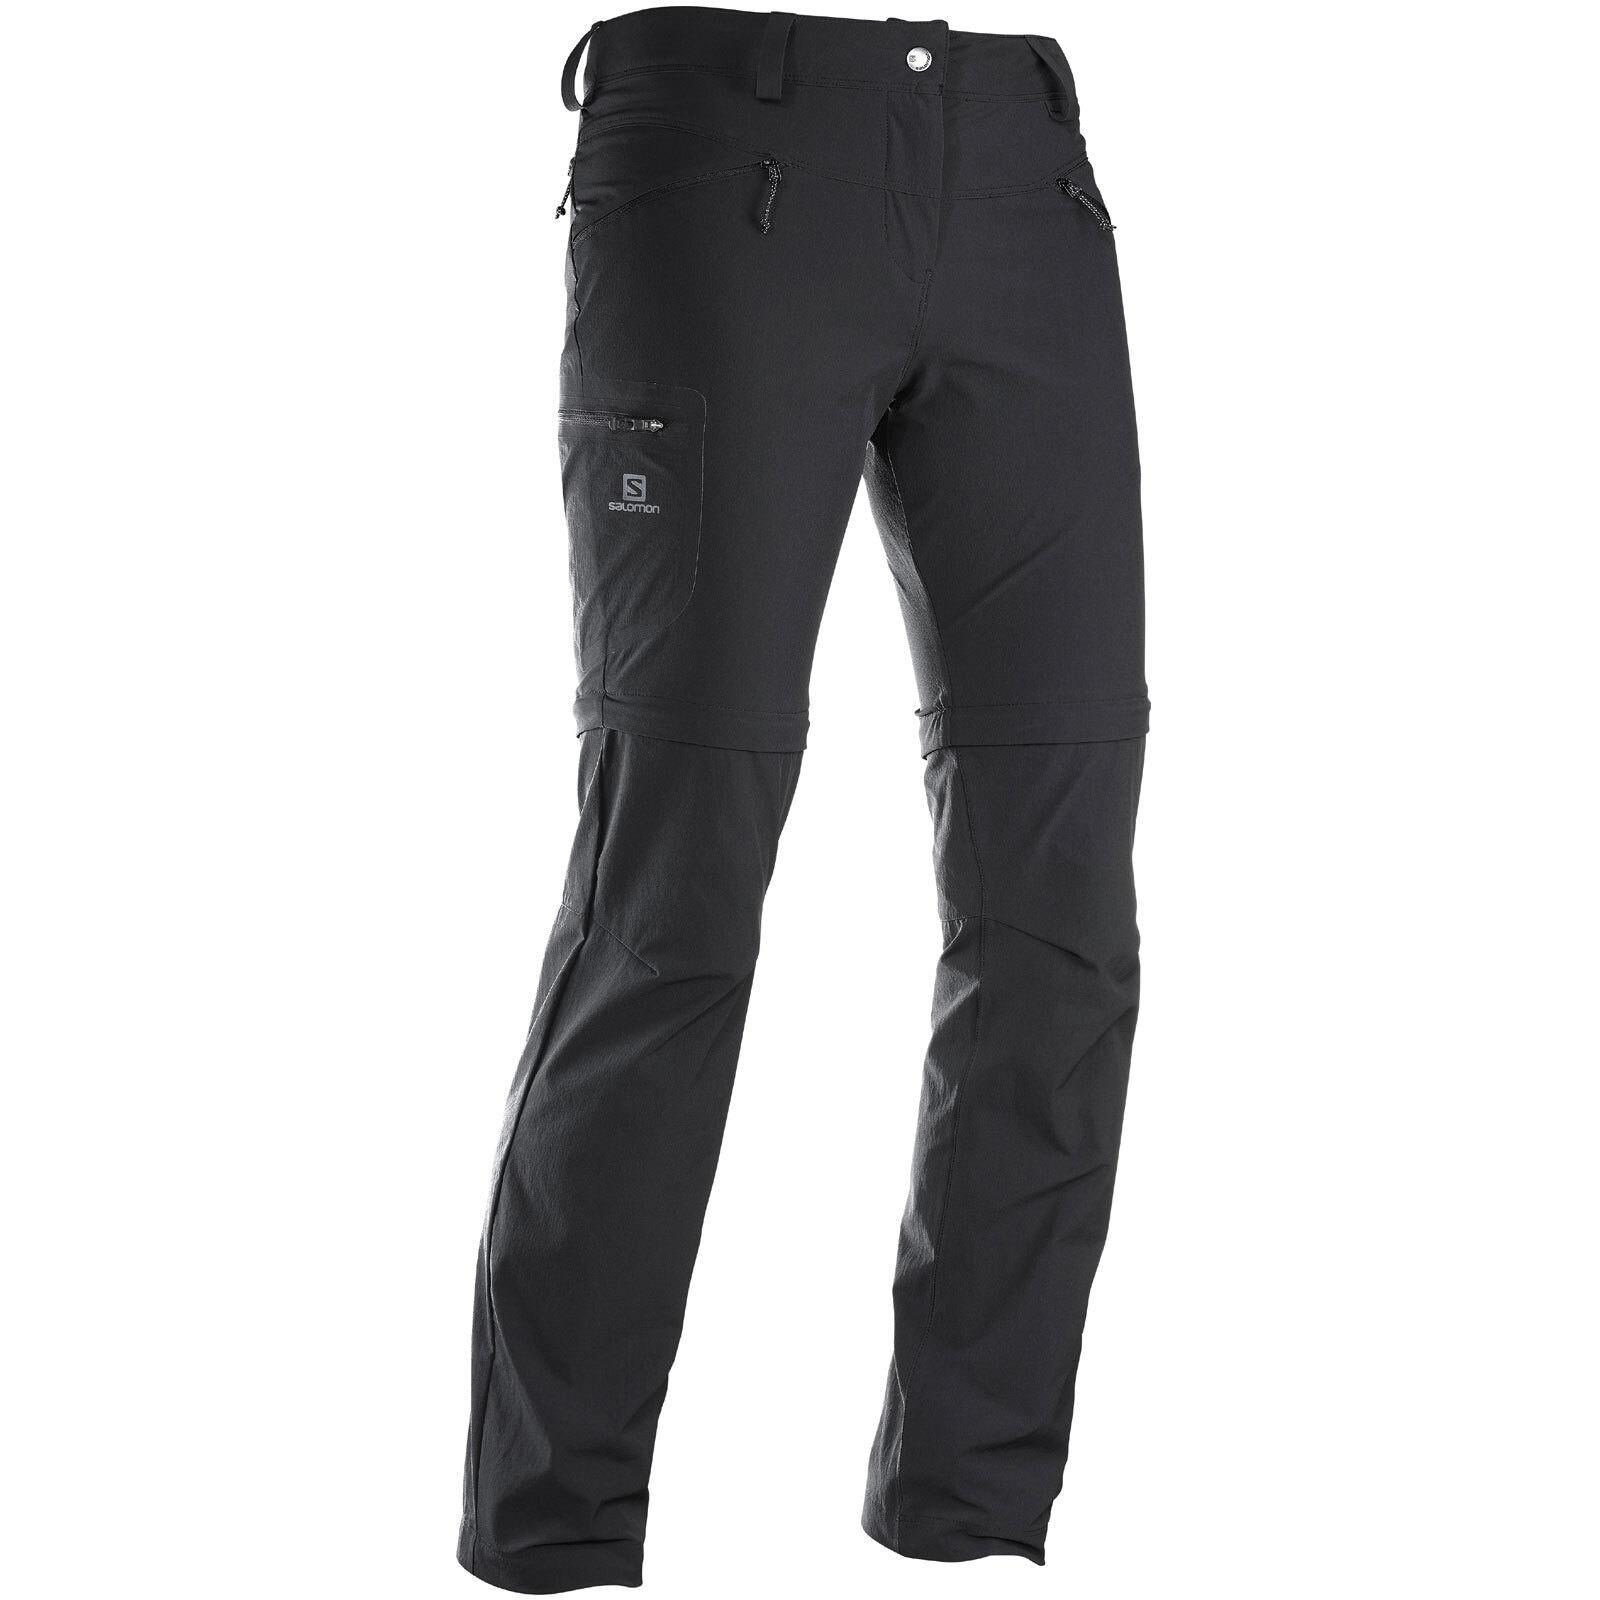 Salomon Outdoor Wayfarer Zip Pant Damenschuhe Hiking Outdoor Salomon Trousers Removable Legs dc8b47